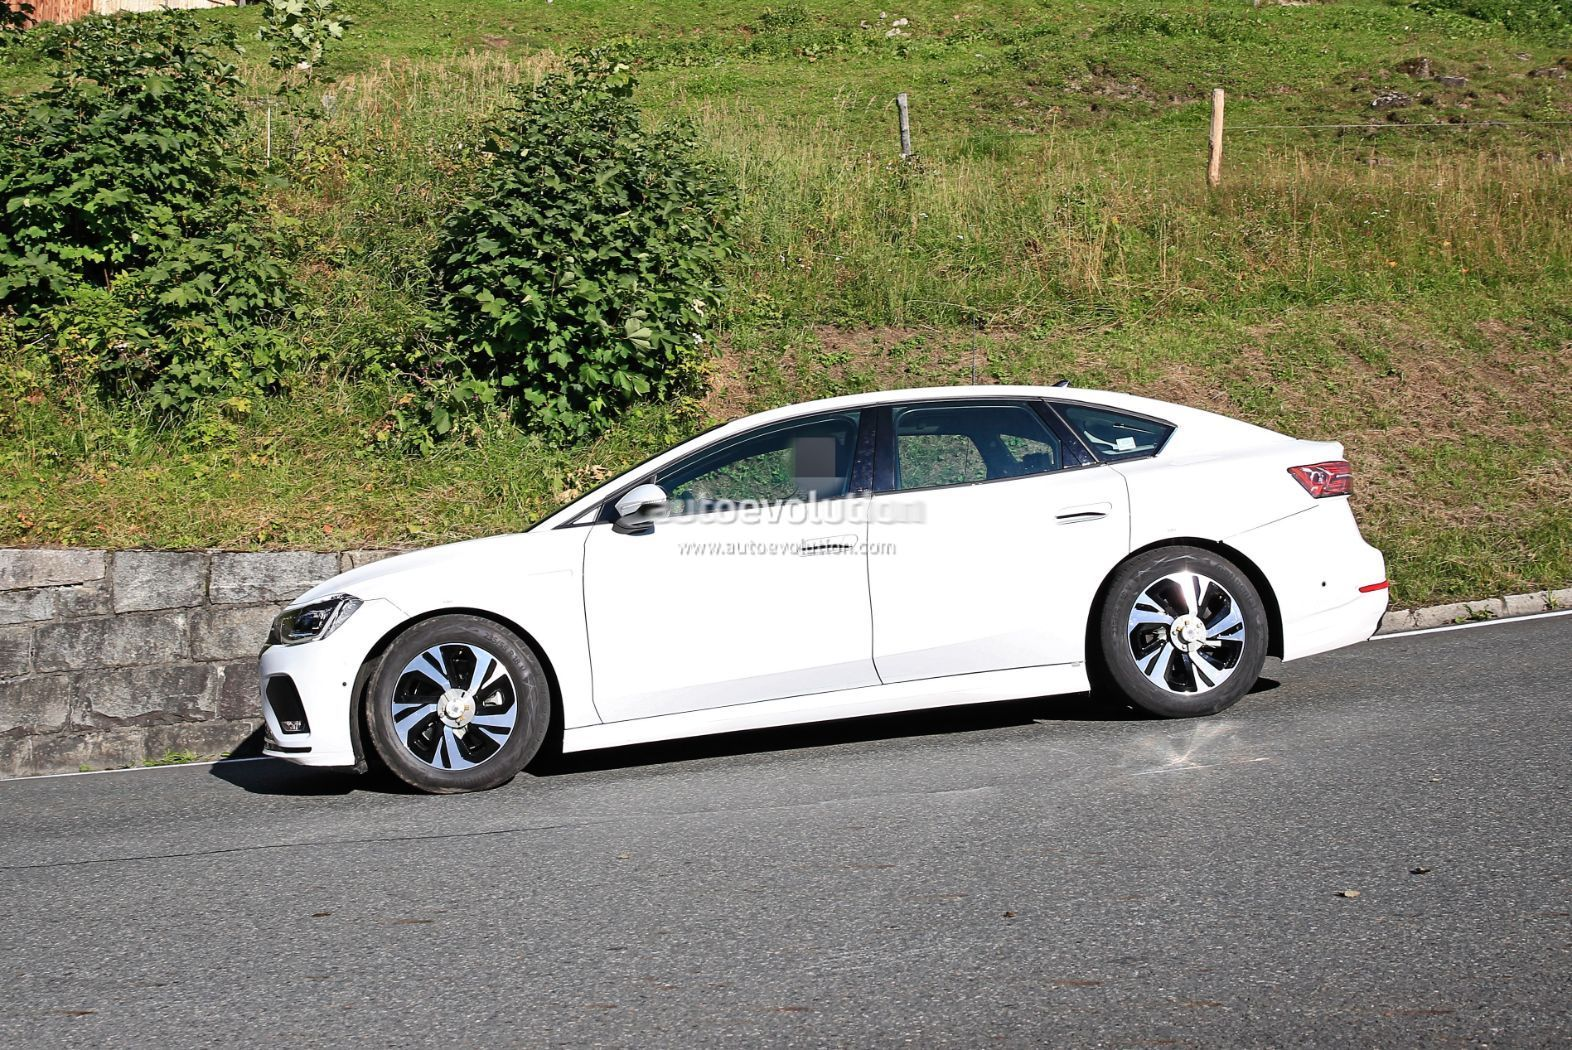 Volkswagen's Tesla Model 3 Rival Begins Public Testing With 435 Miles Range